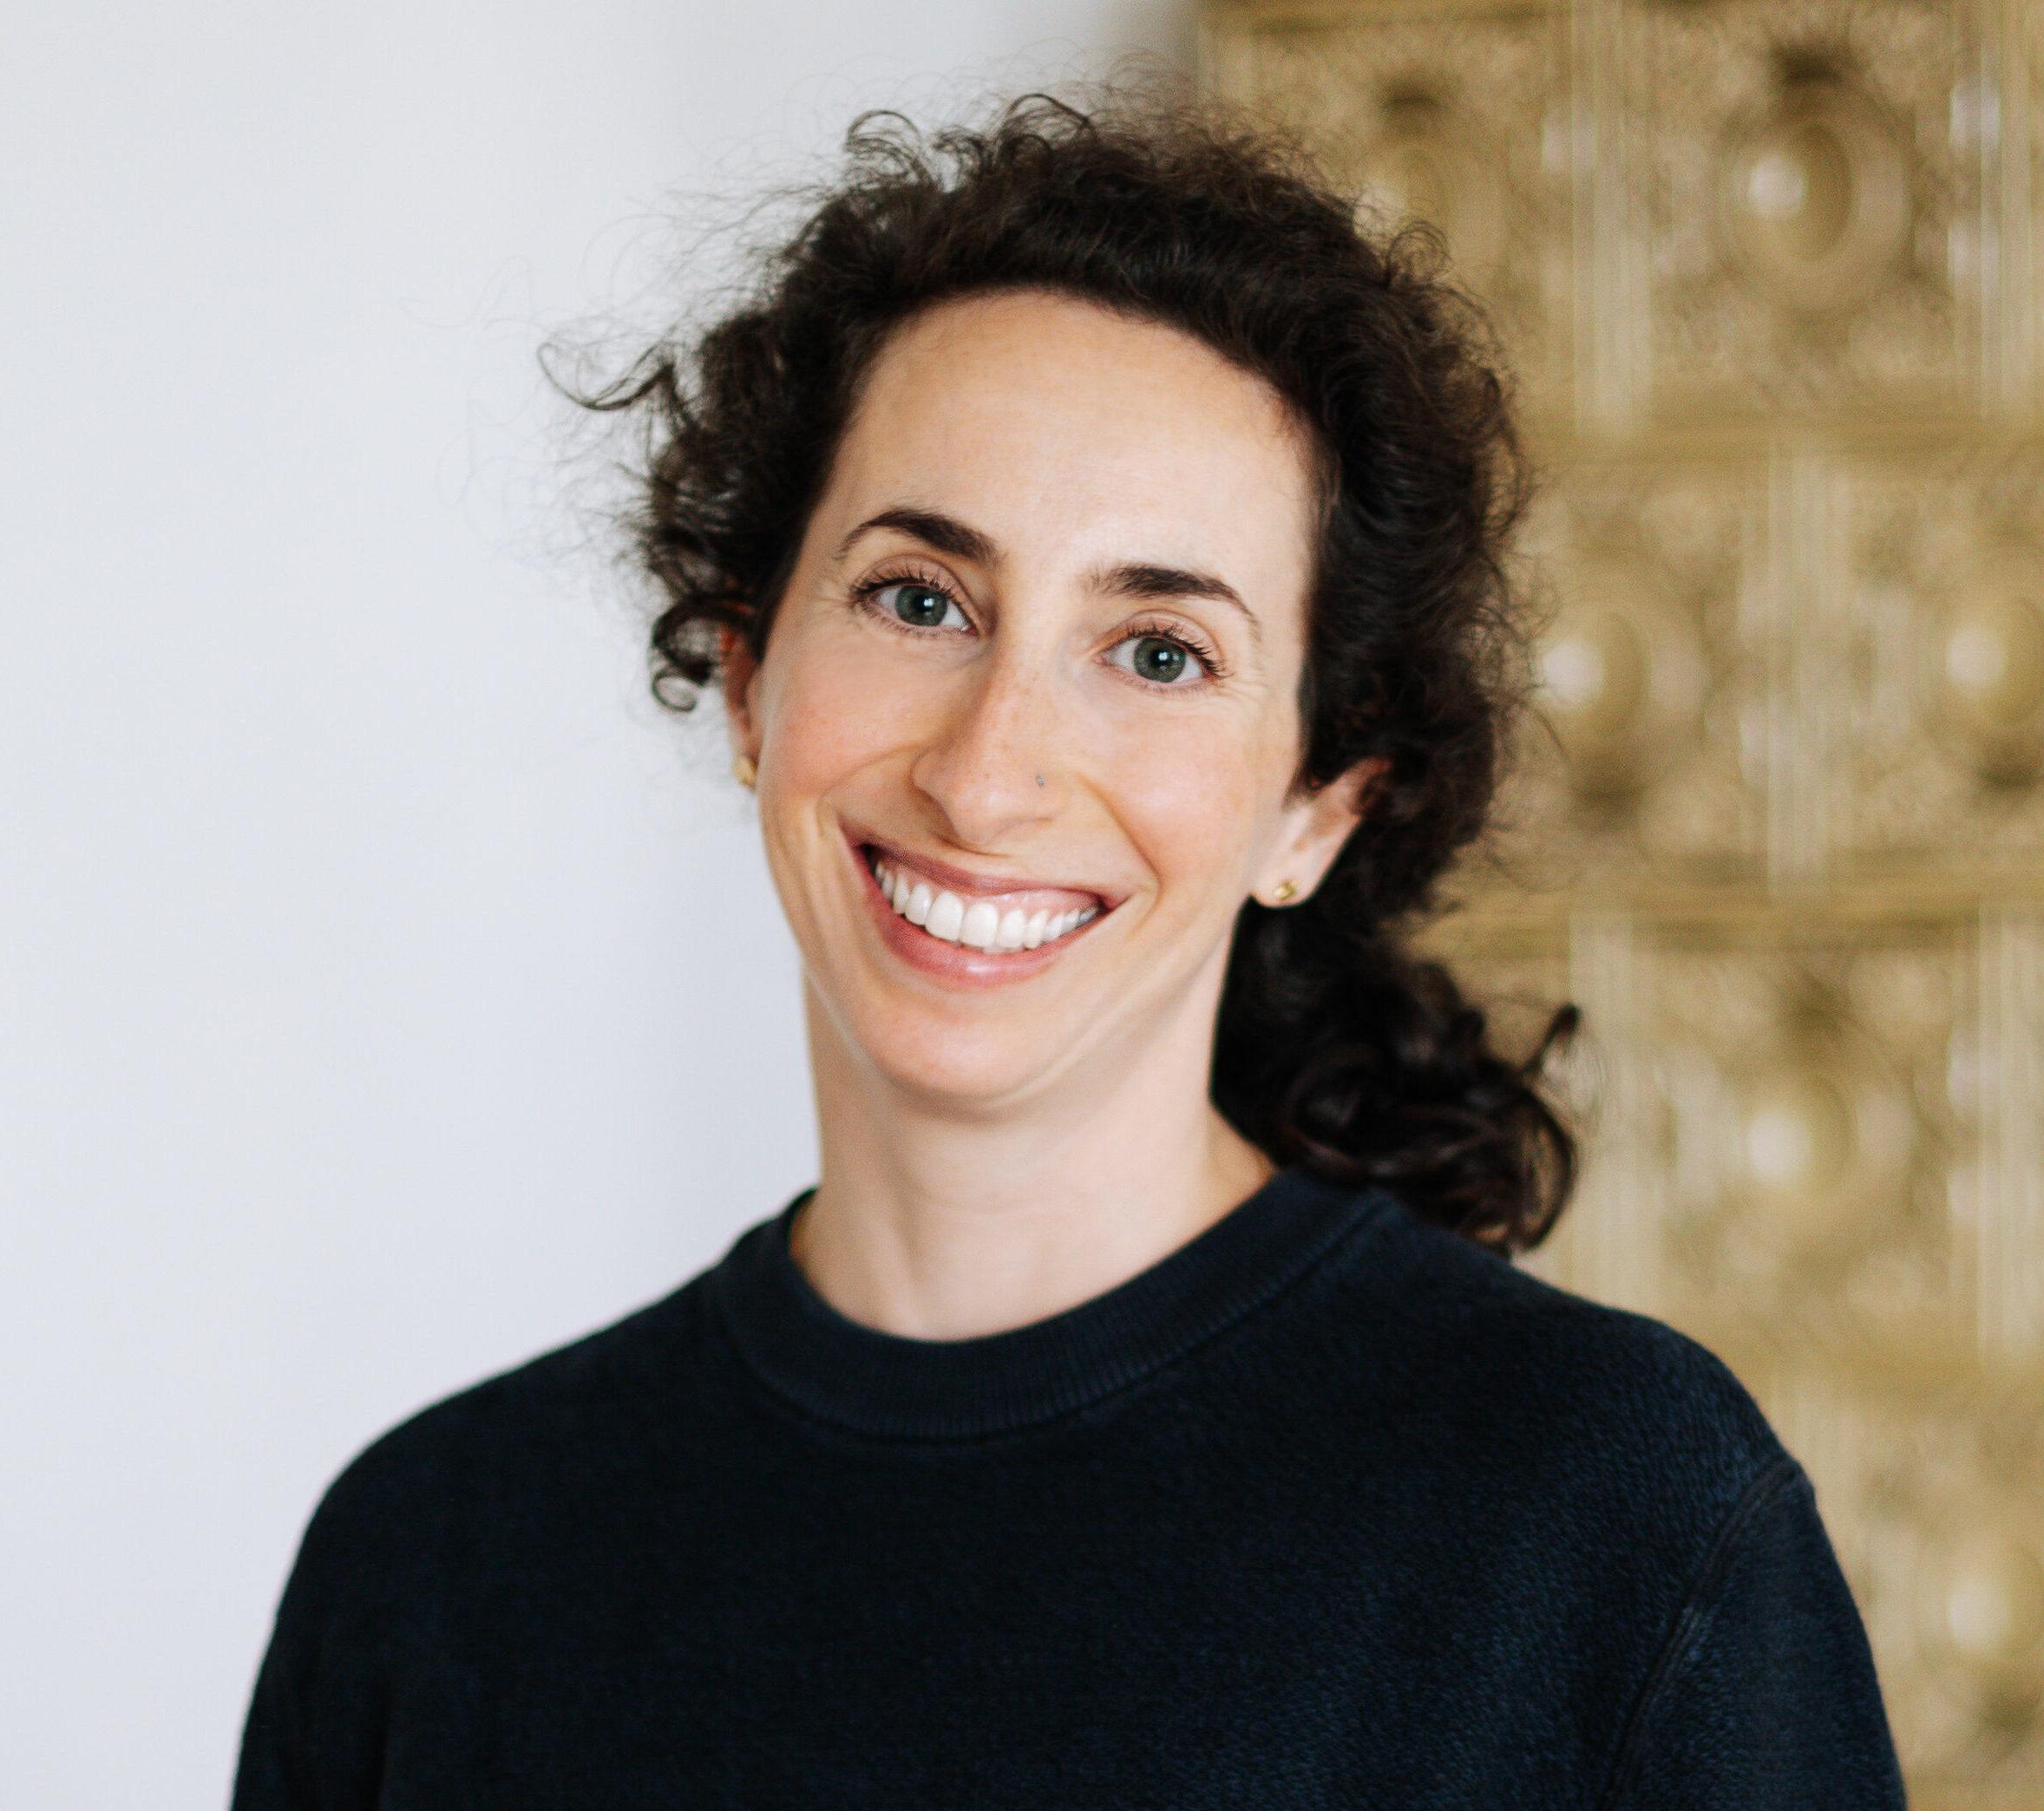 Portrait of Sarah Scharf - Flow & Restore Yoga teacher at RE:TREAT